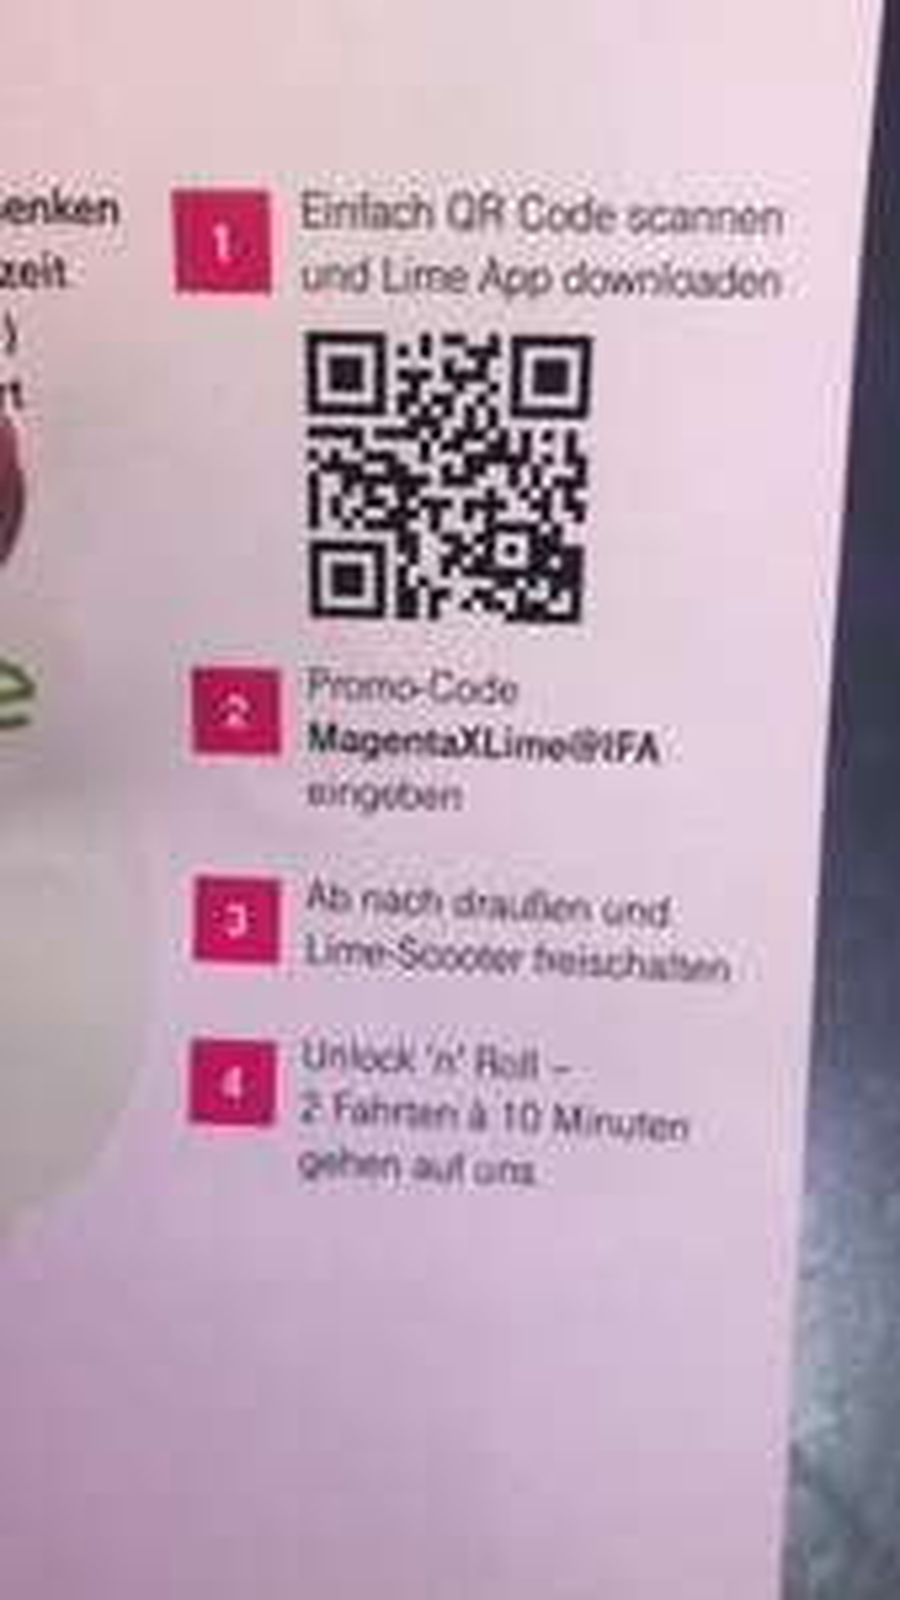 (Lokal Berlin) LIME 2 Freifahrten á 10 Minuten